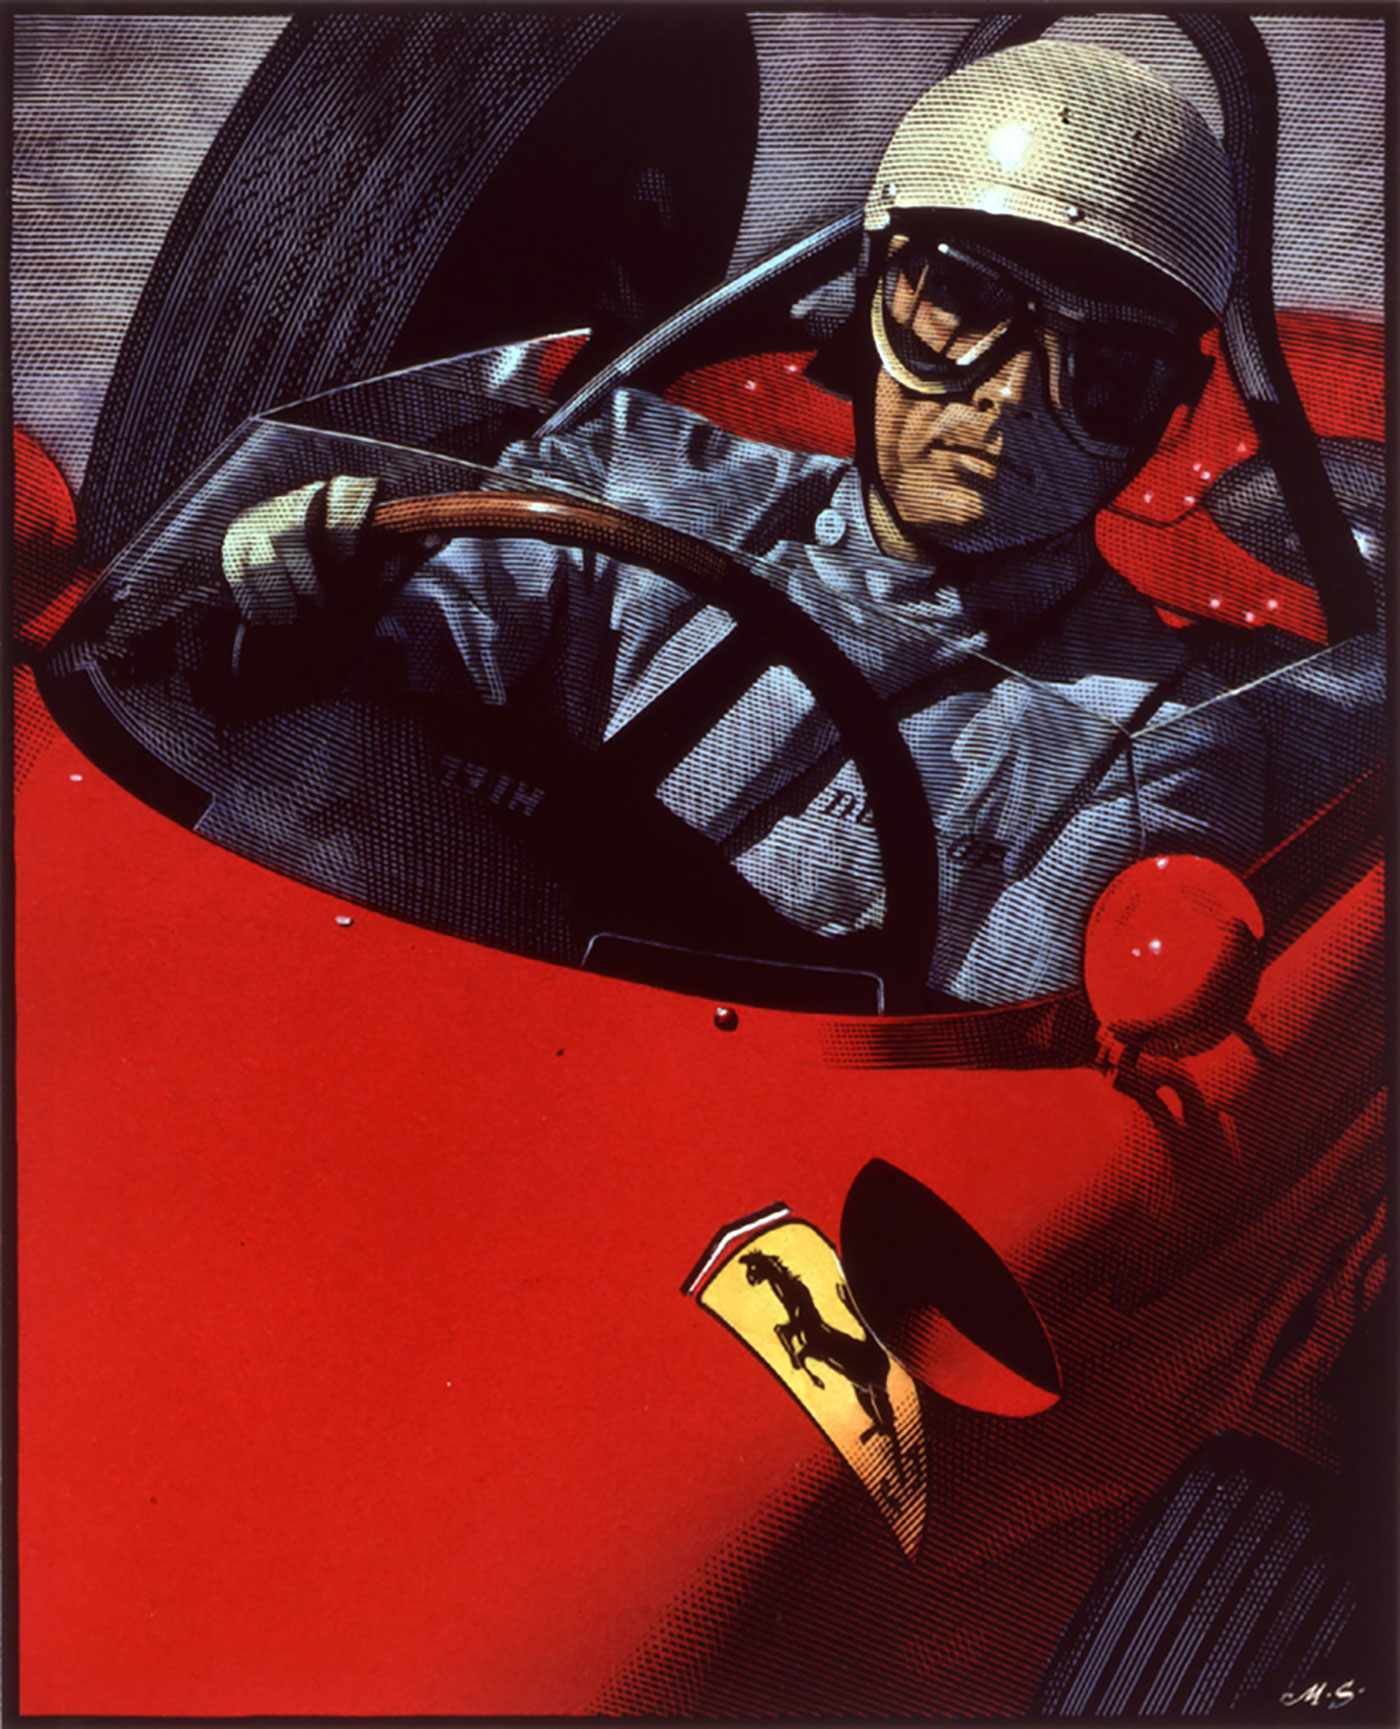 Richard Solomon - Mark-Summers-171-Phil-Hill-Racecar